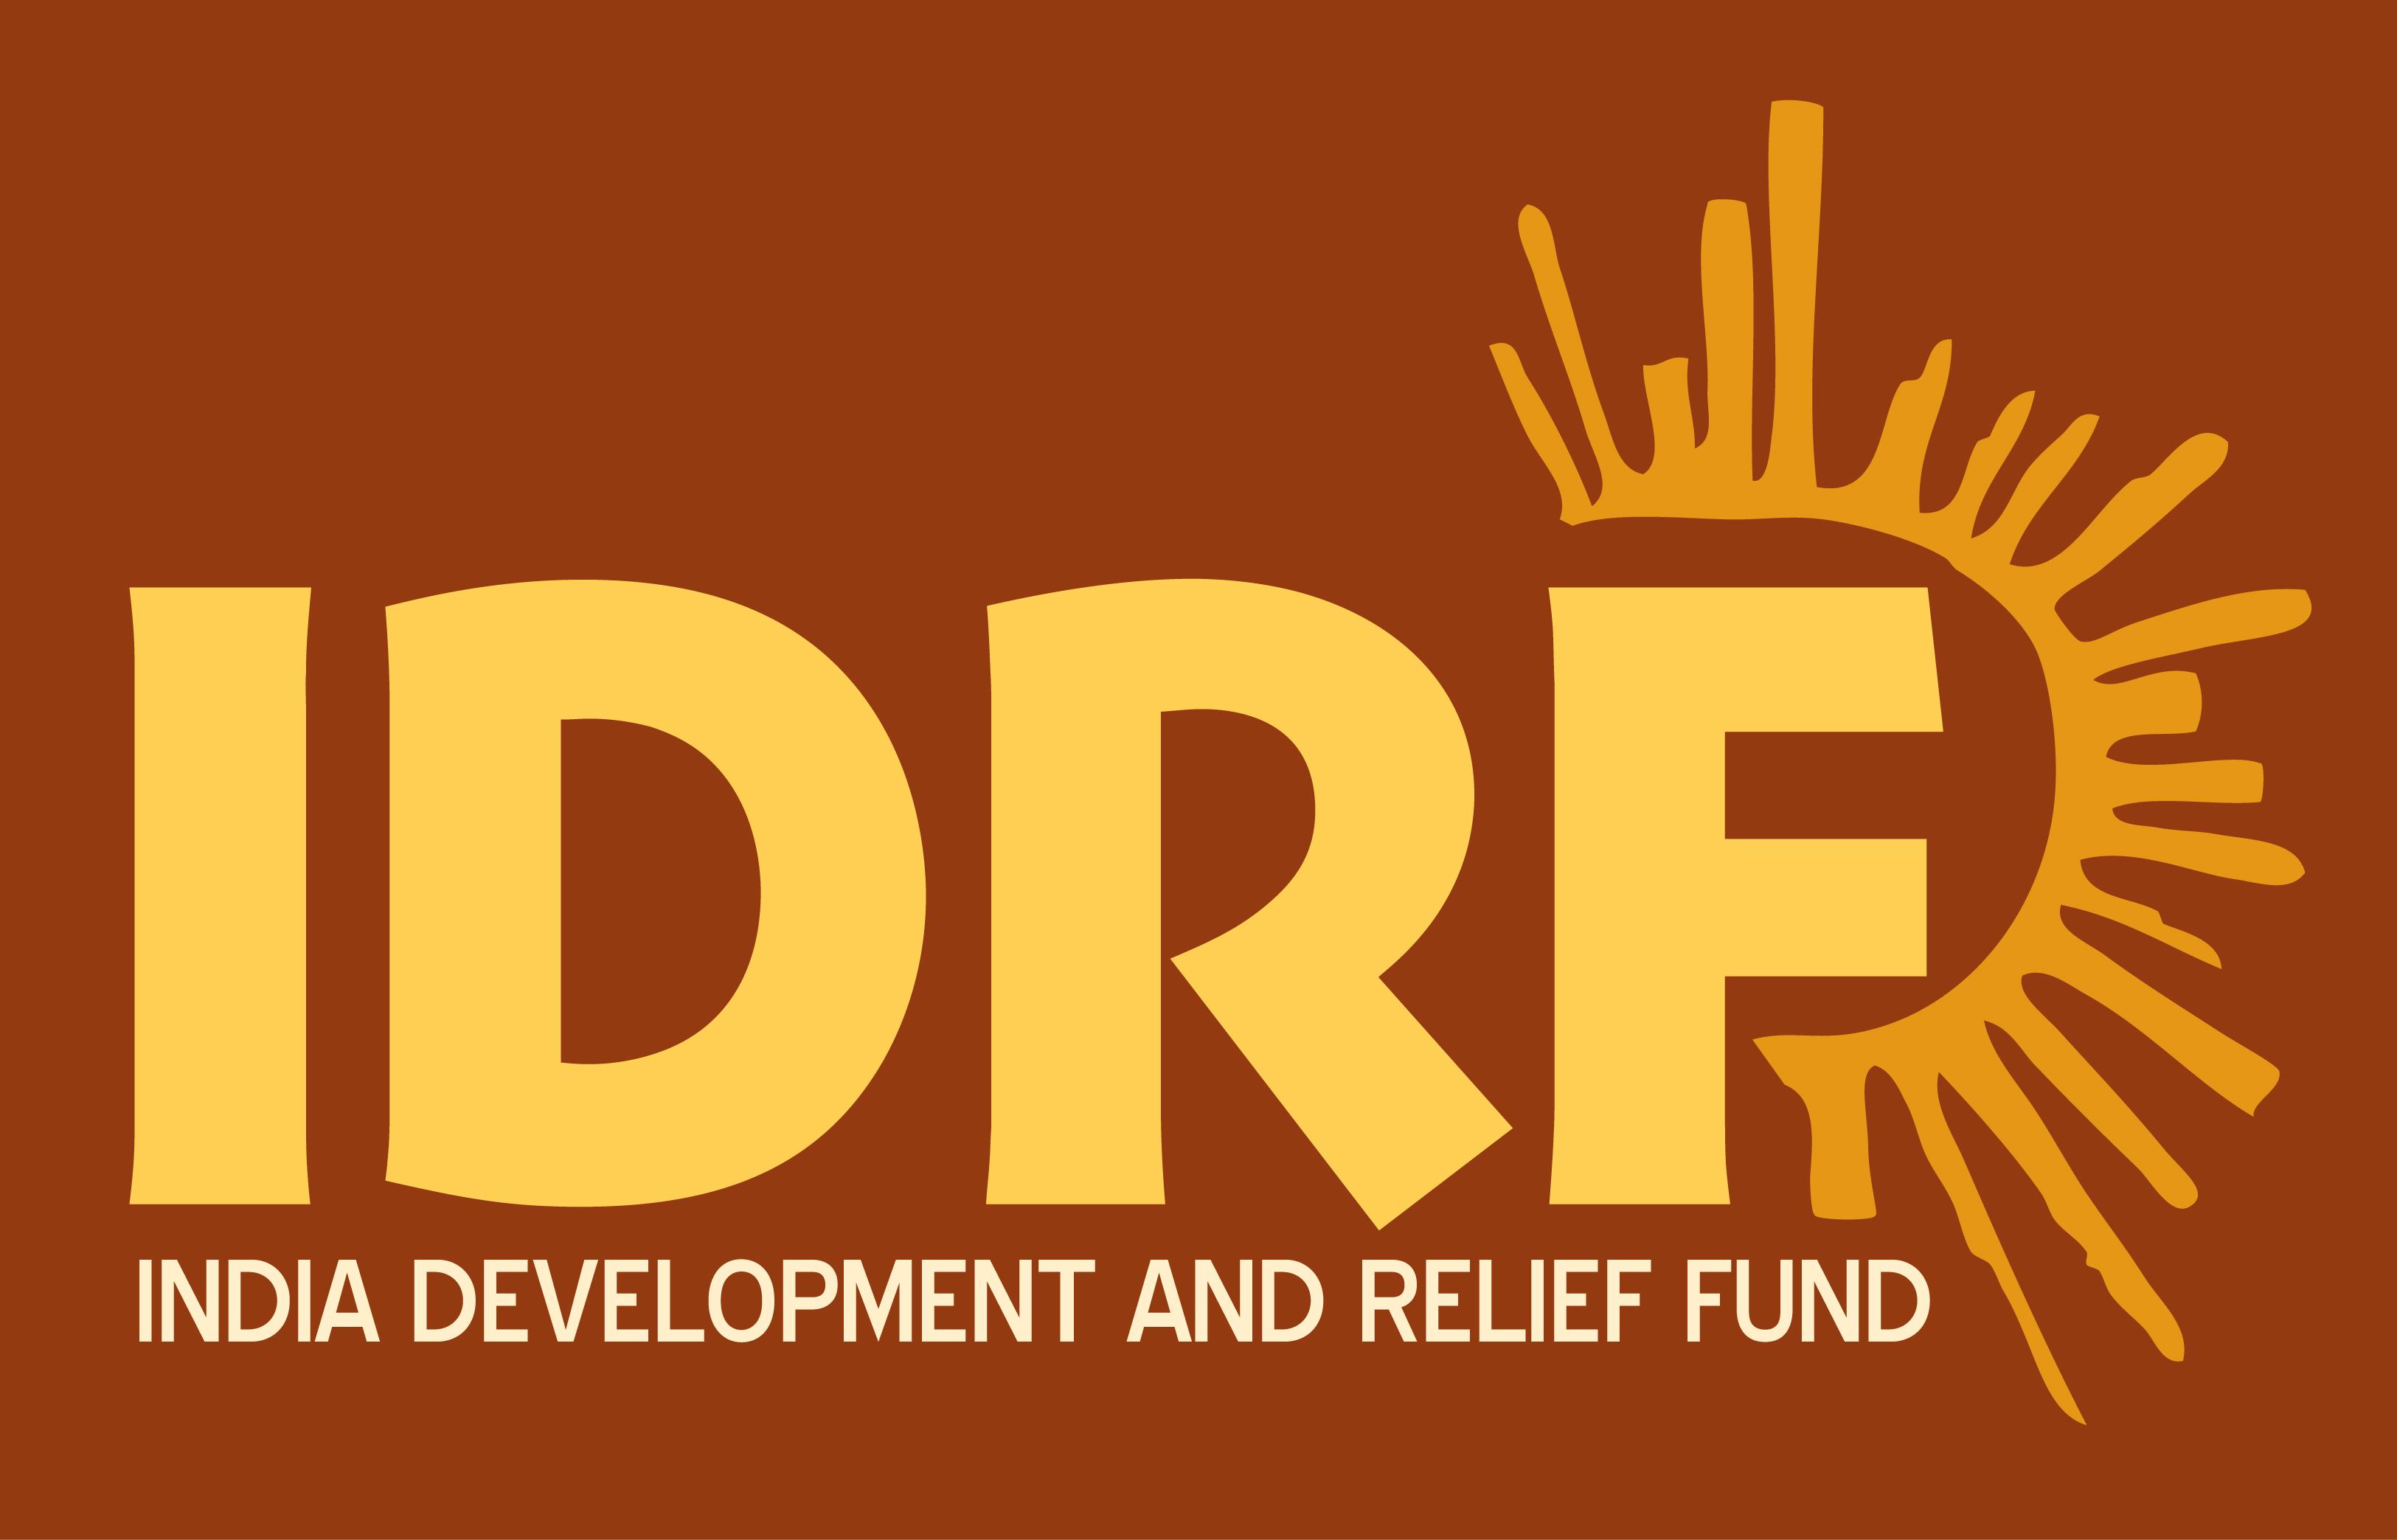 Logo of charity IDRF